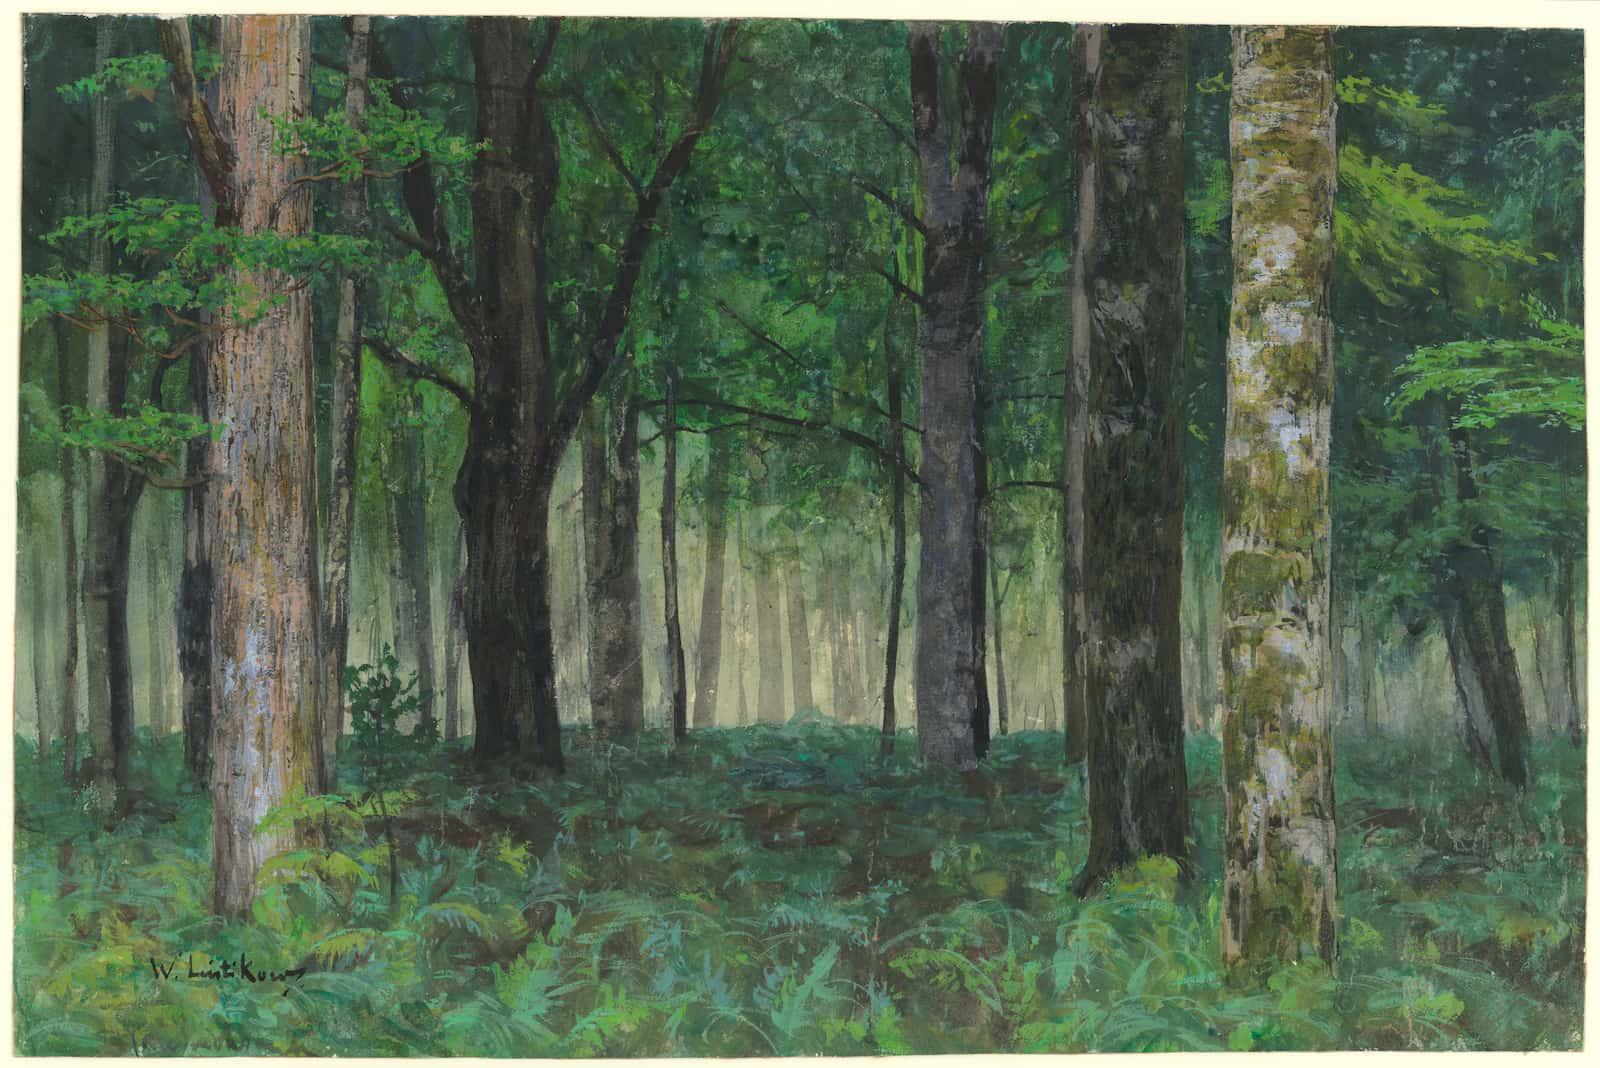 Martin Moeller, Walter Leistikow, La forêt près de Friedrichsruh